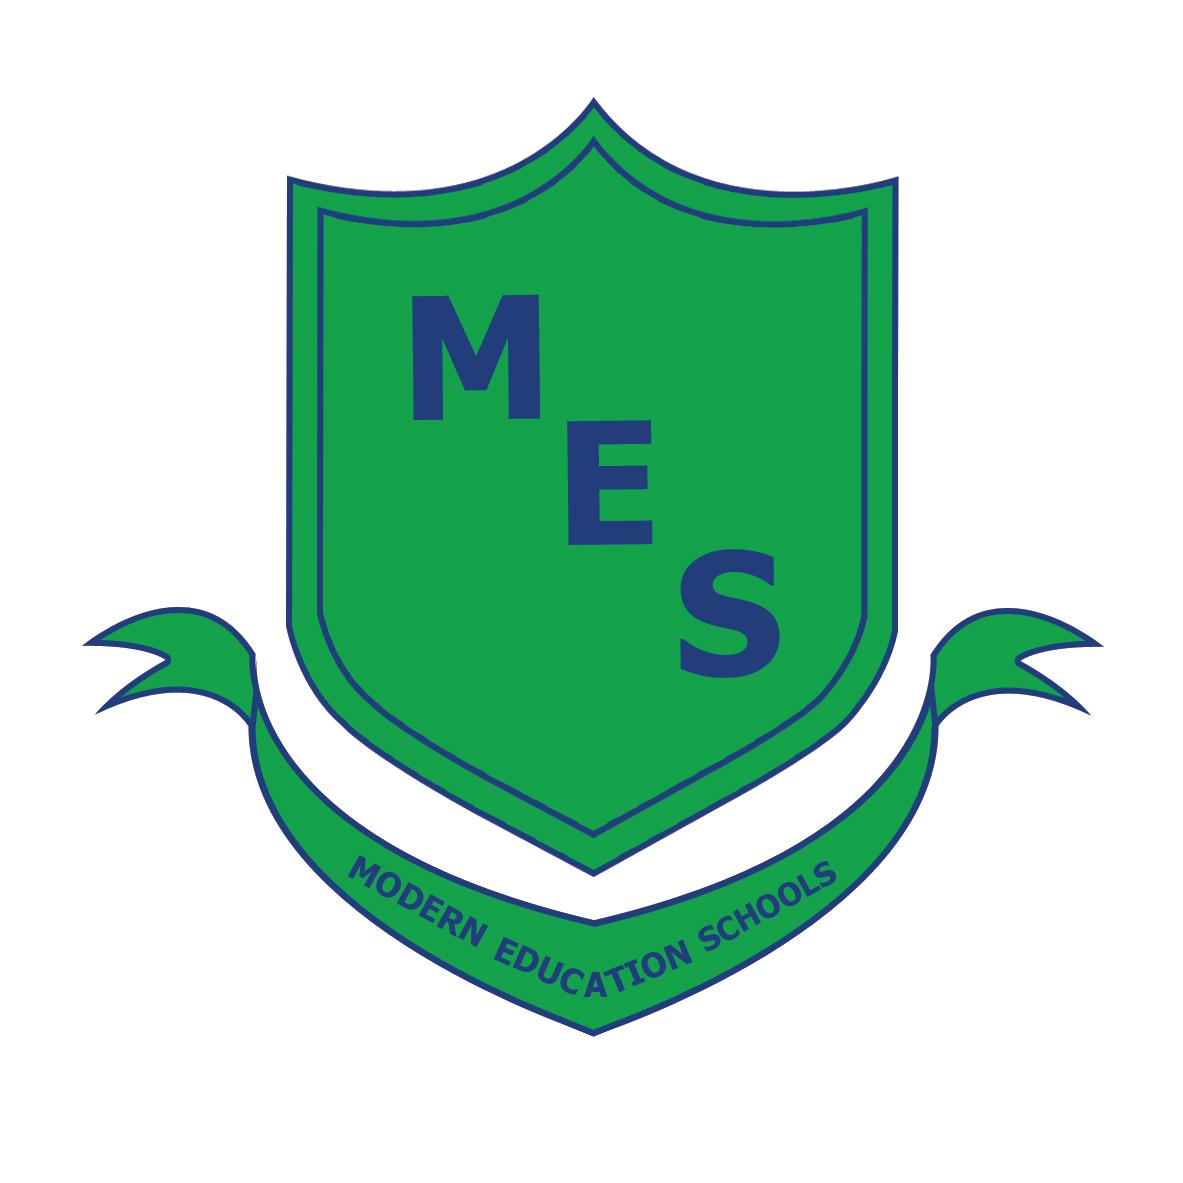 Modern Education School